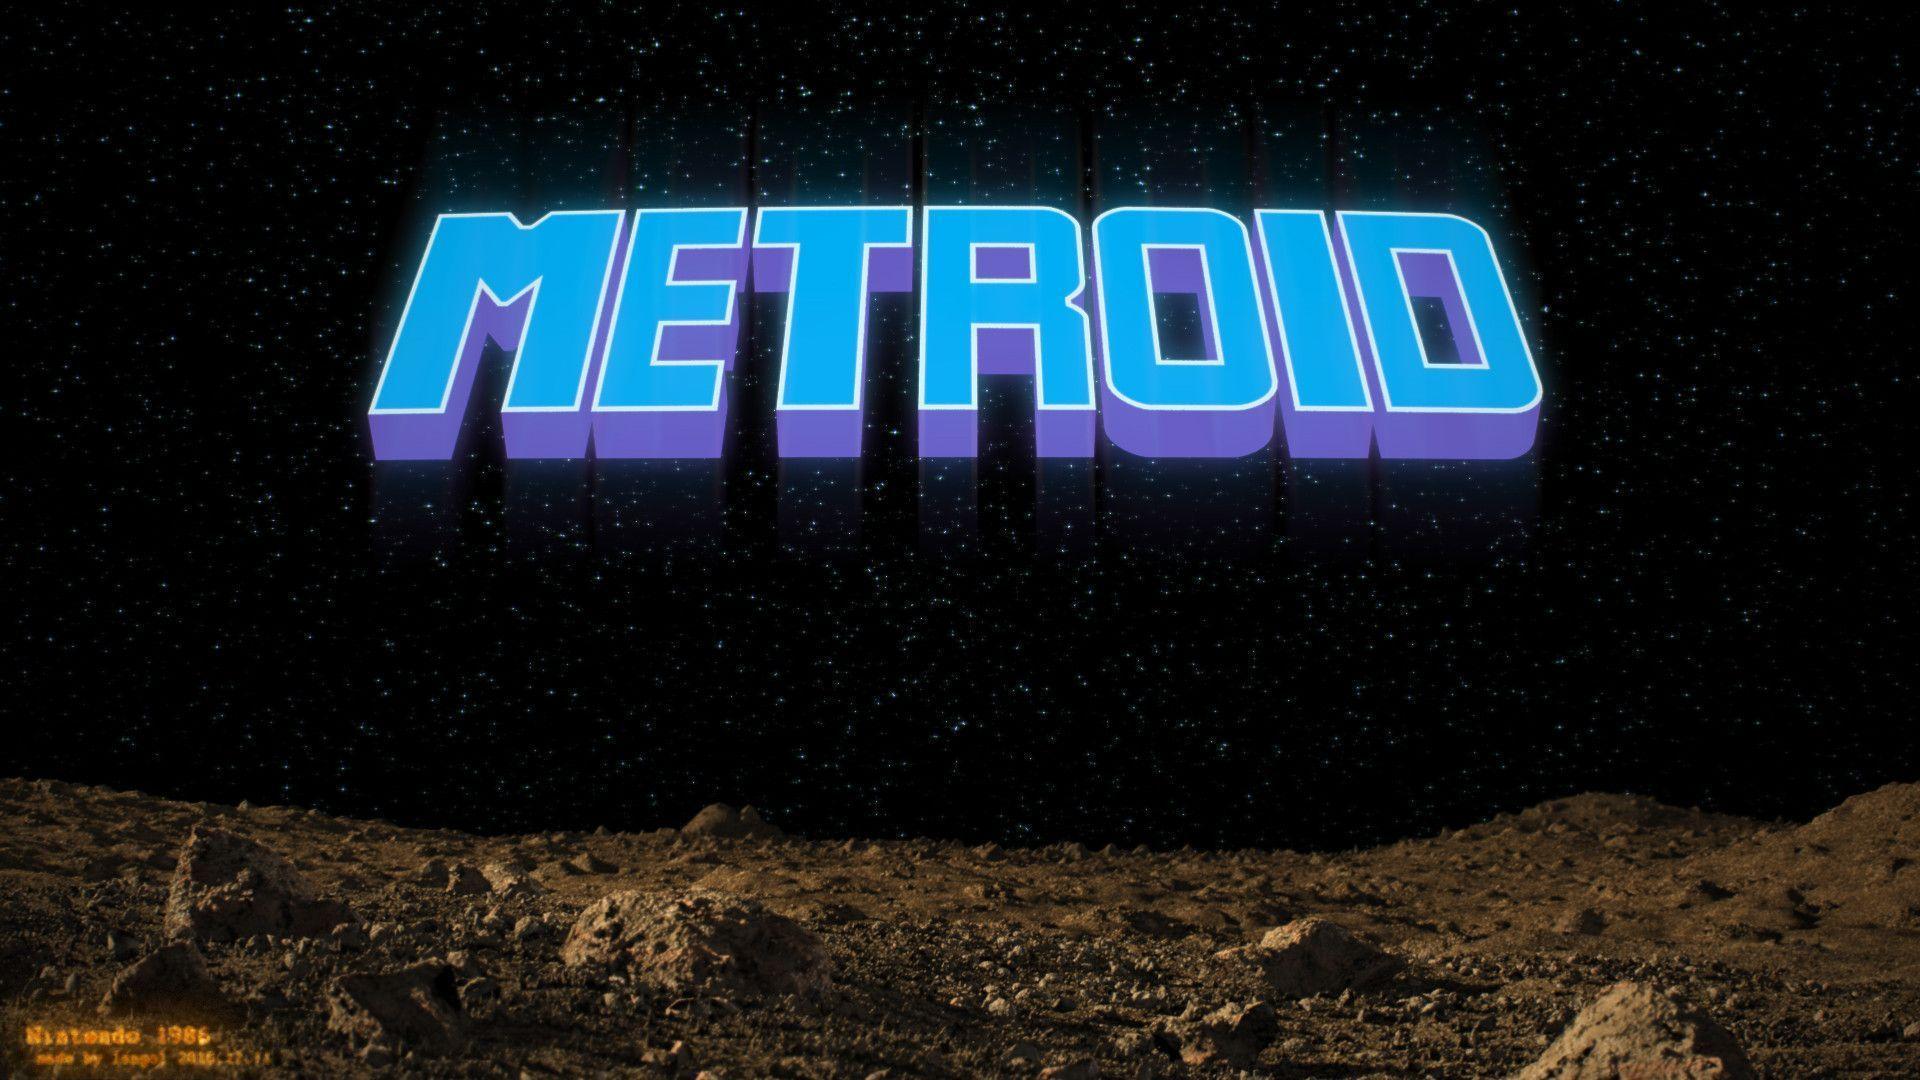 Metroid backgrounds wallpaper cave - Title wallpaper ...